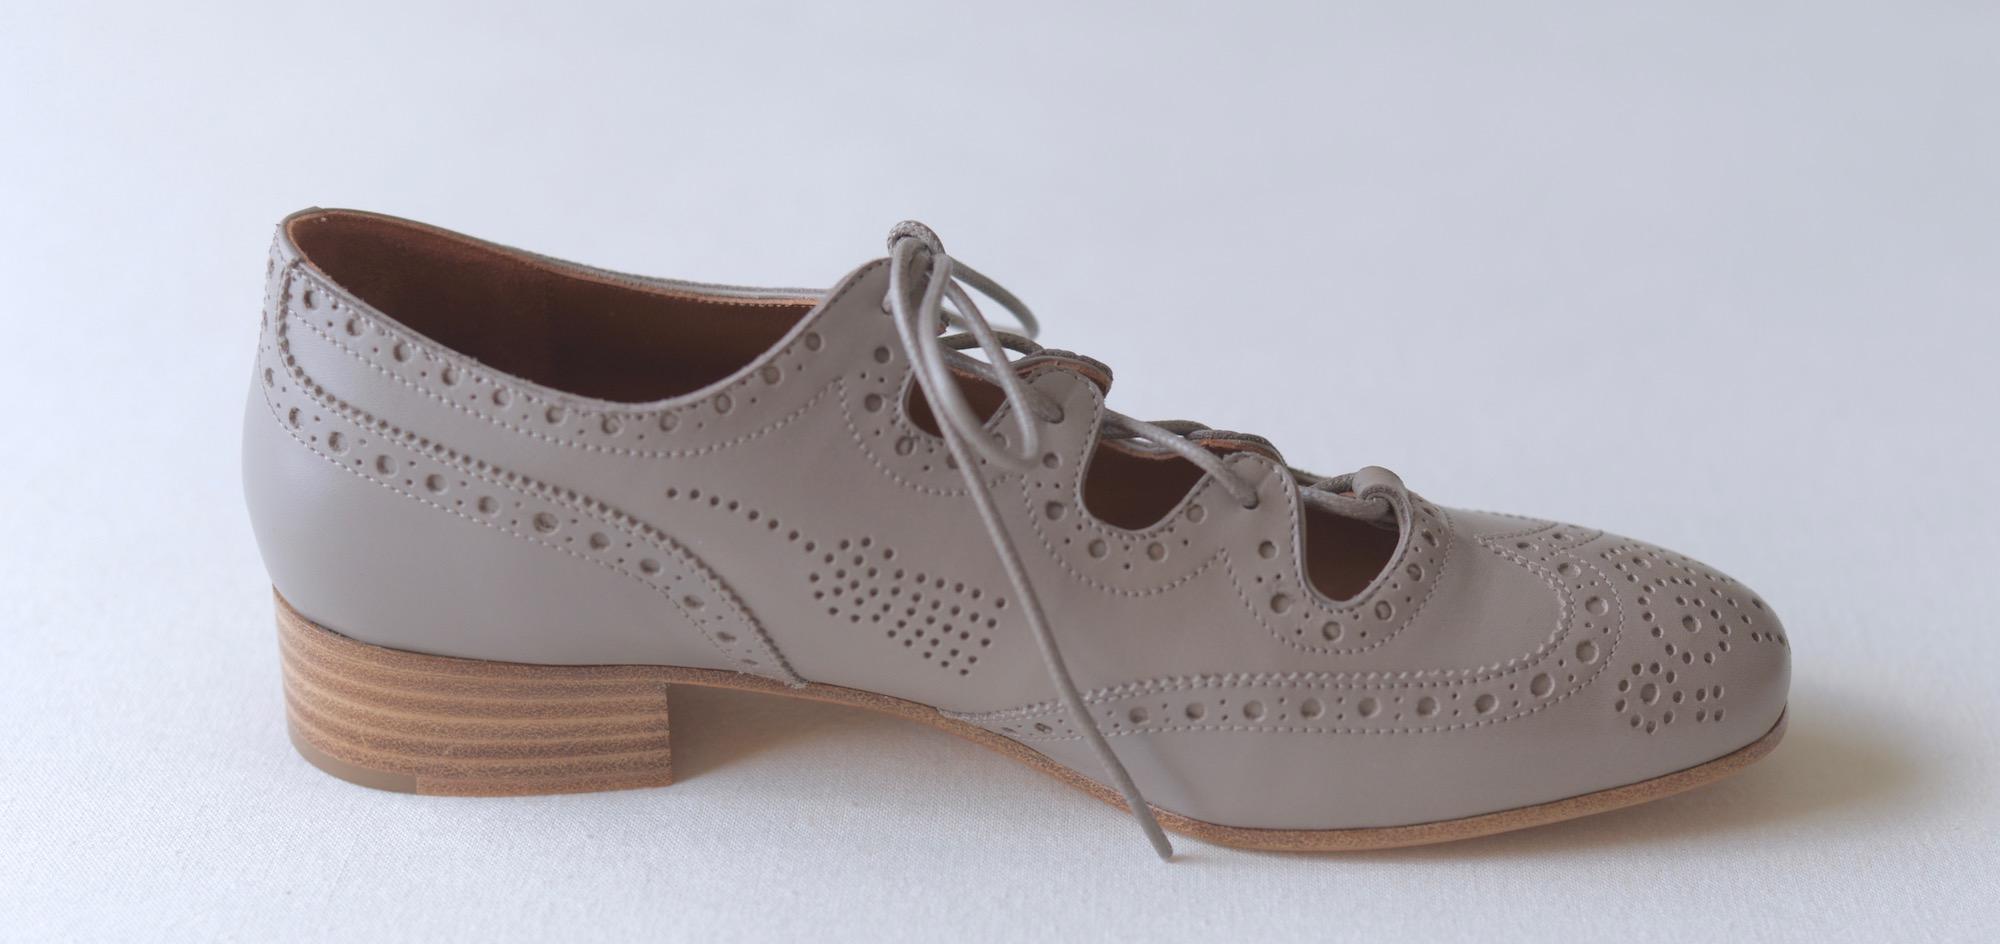 DIVINA 靴 イタリア 革靴 エルメス ジルサンダー